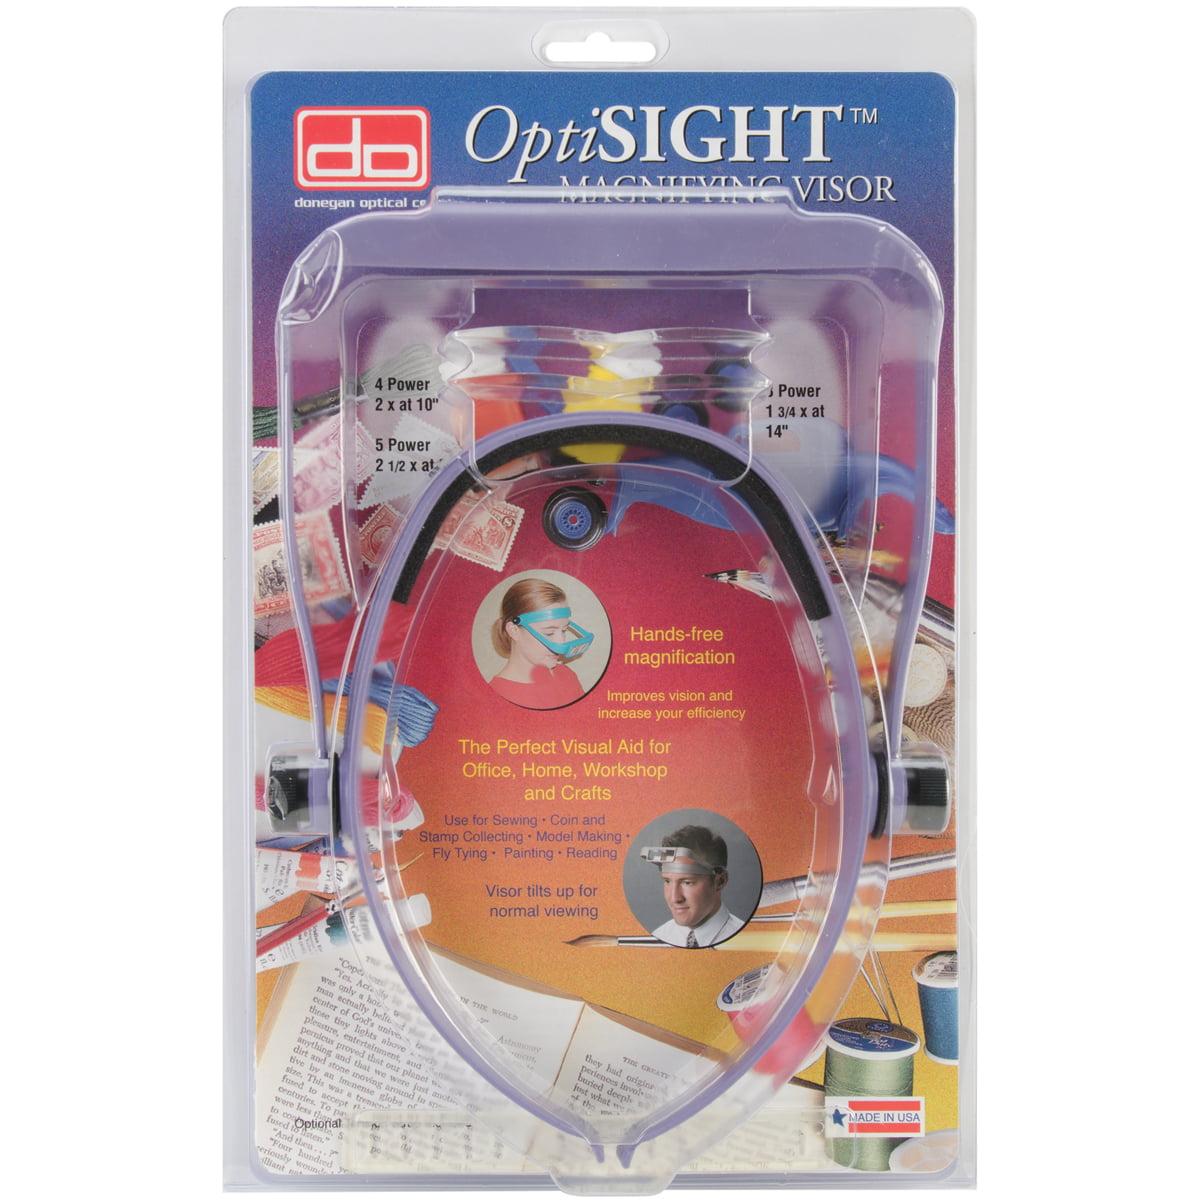 Donegan OptiSIGHT Magnifying Visor-Purple